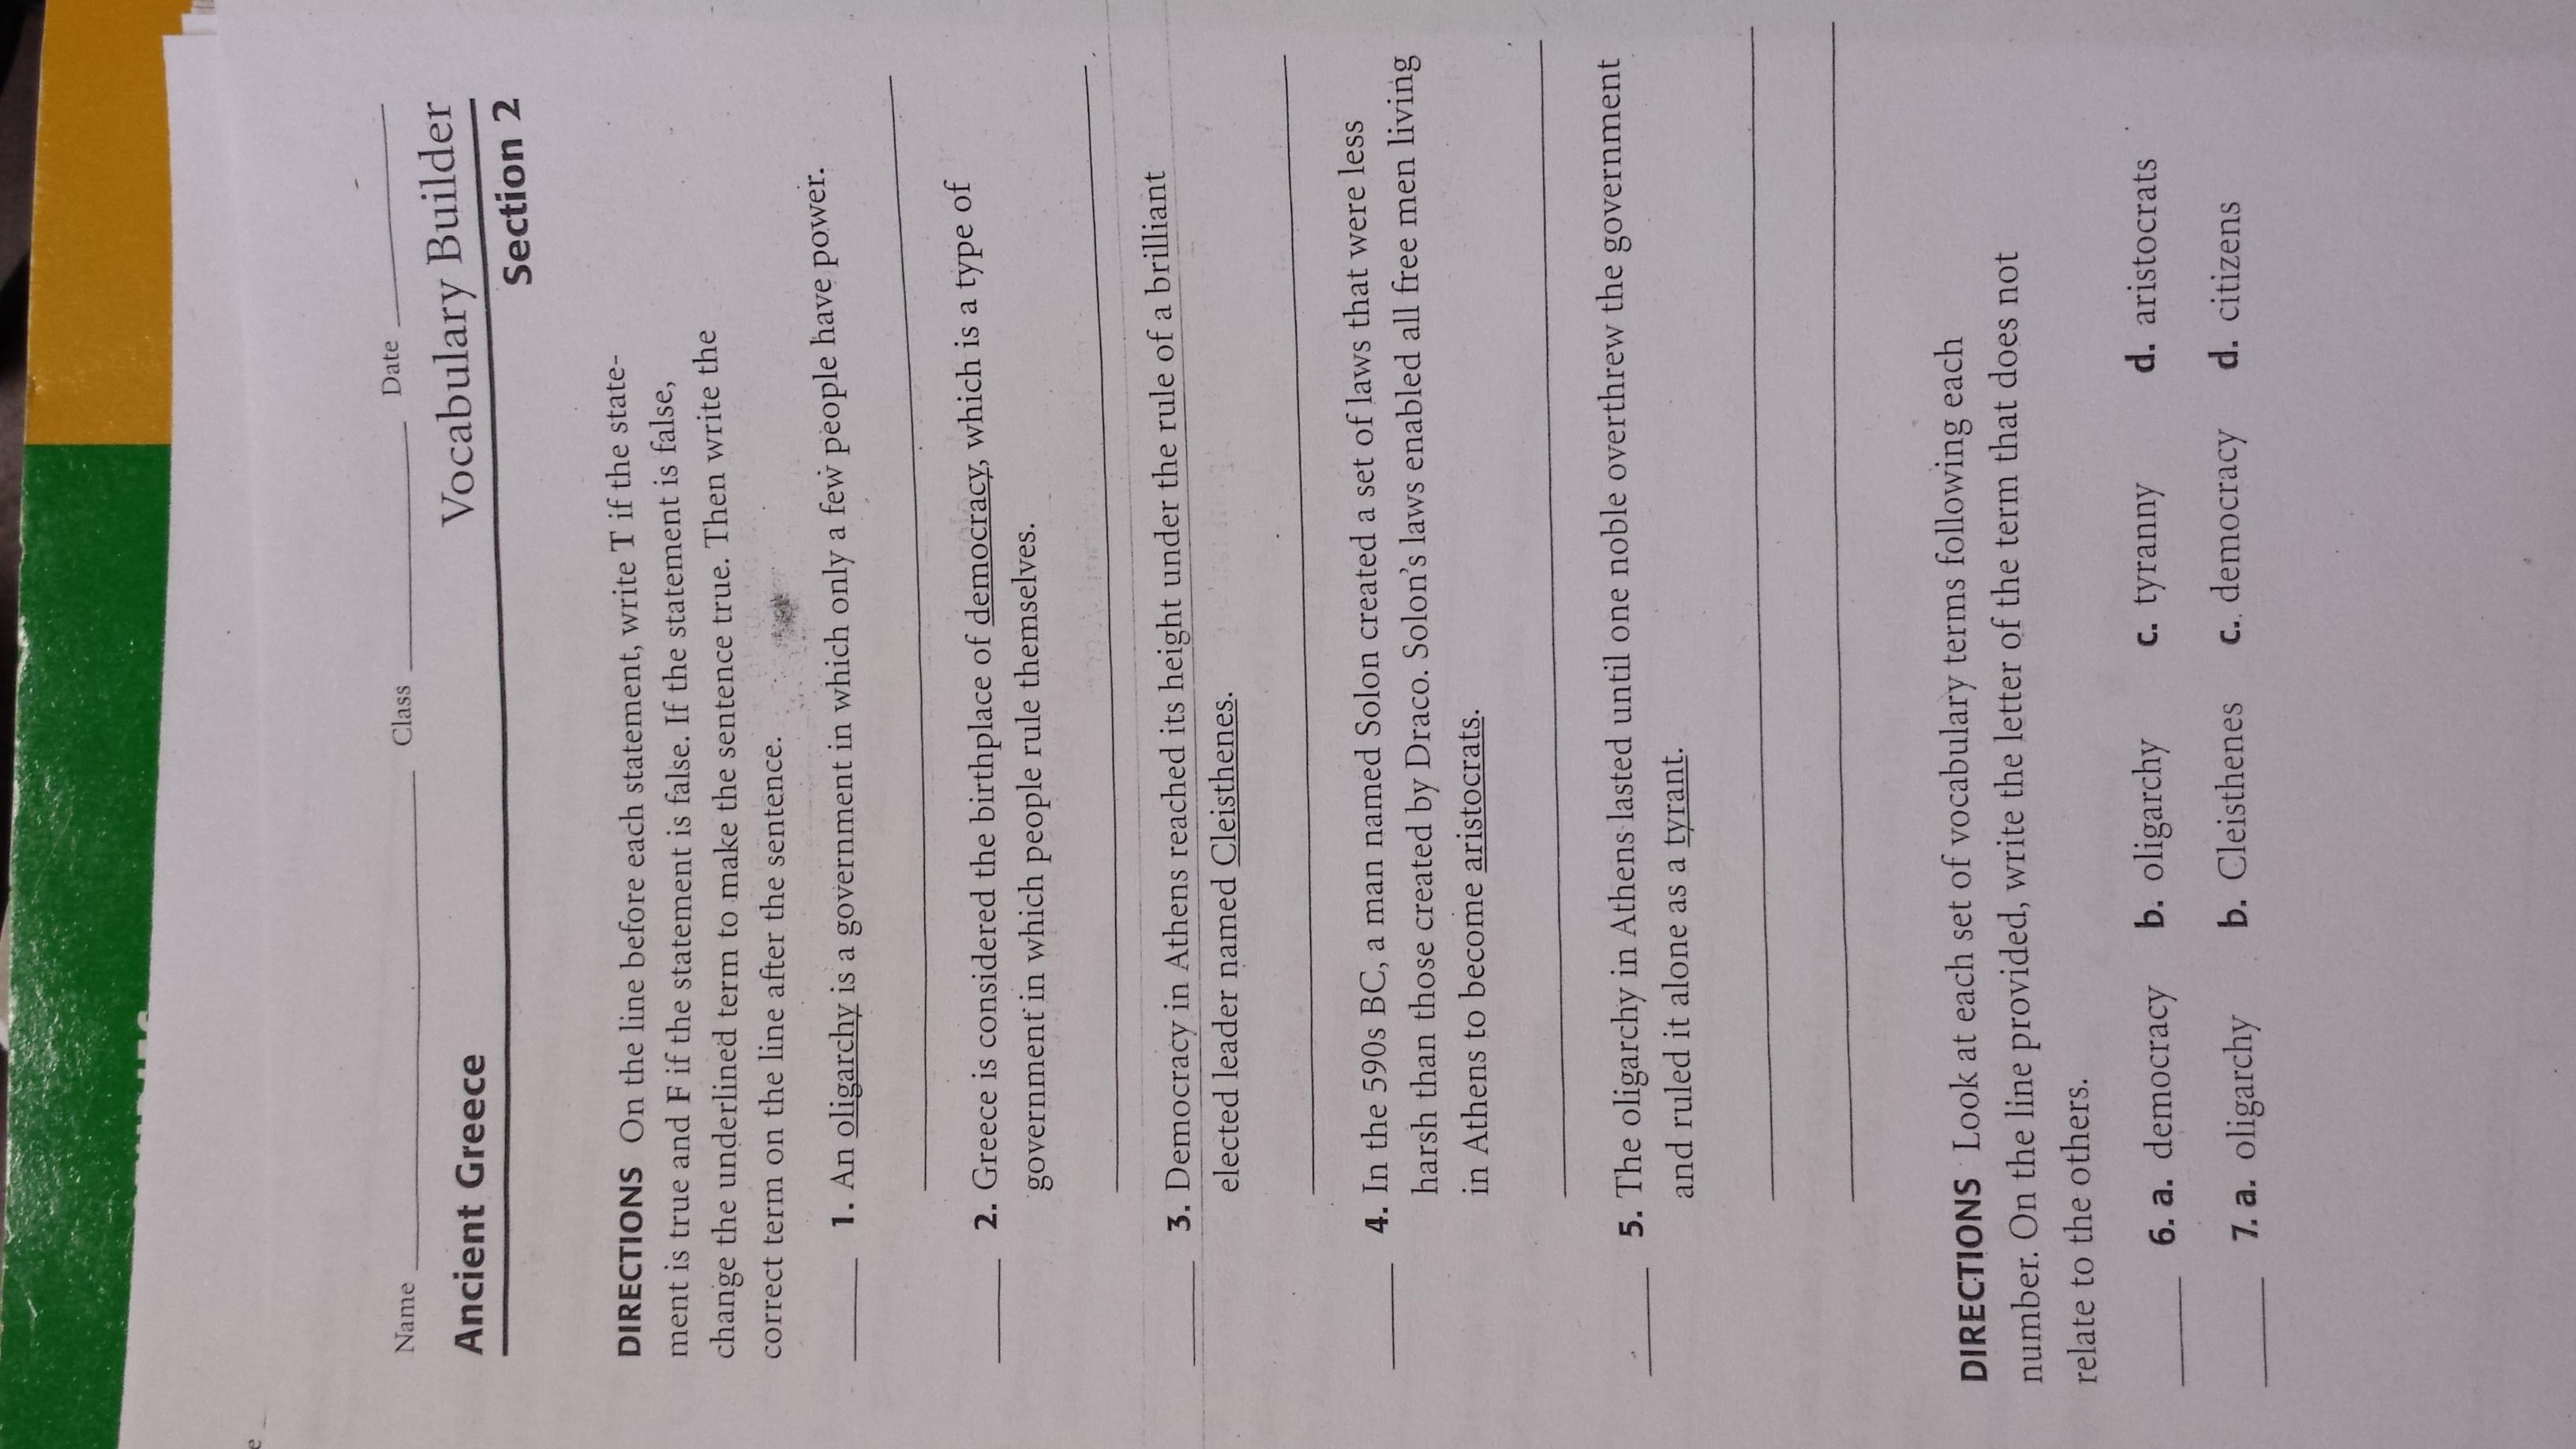 Wedel Cyndra Planner Classwork And Homework Info